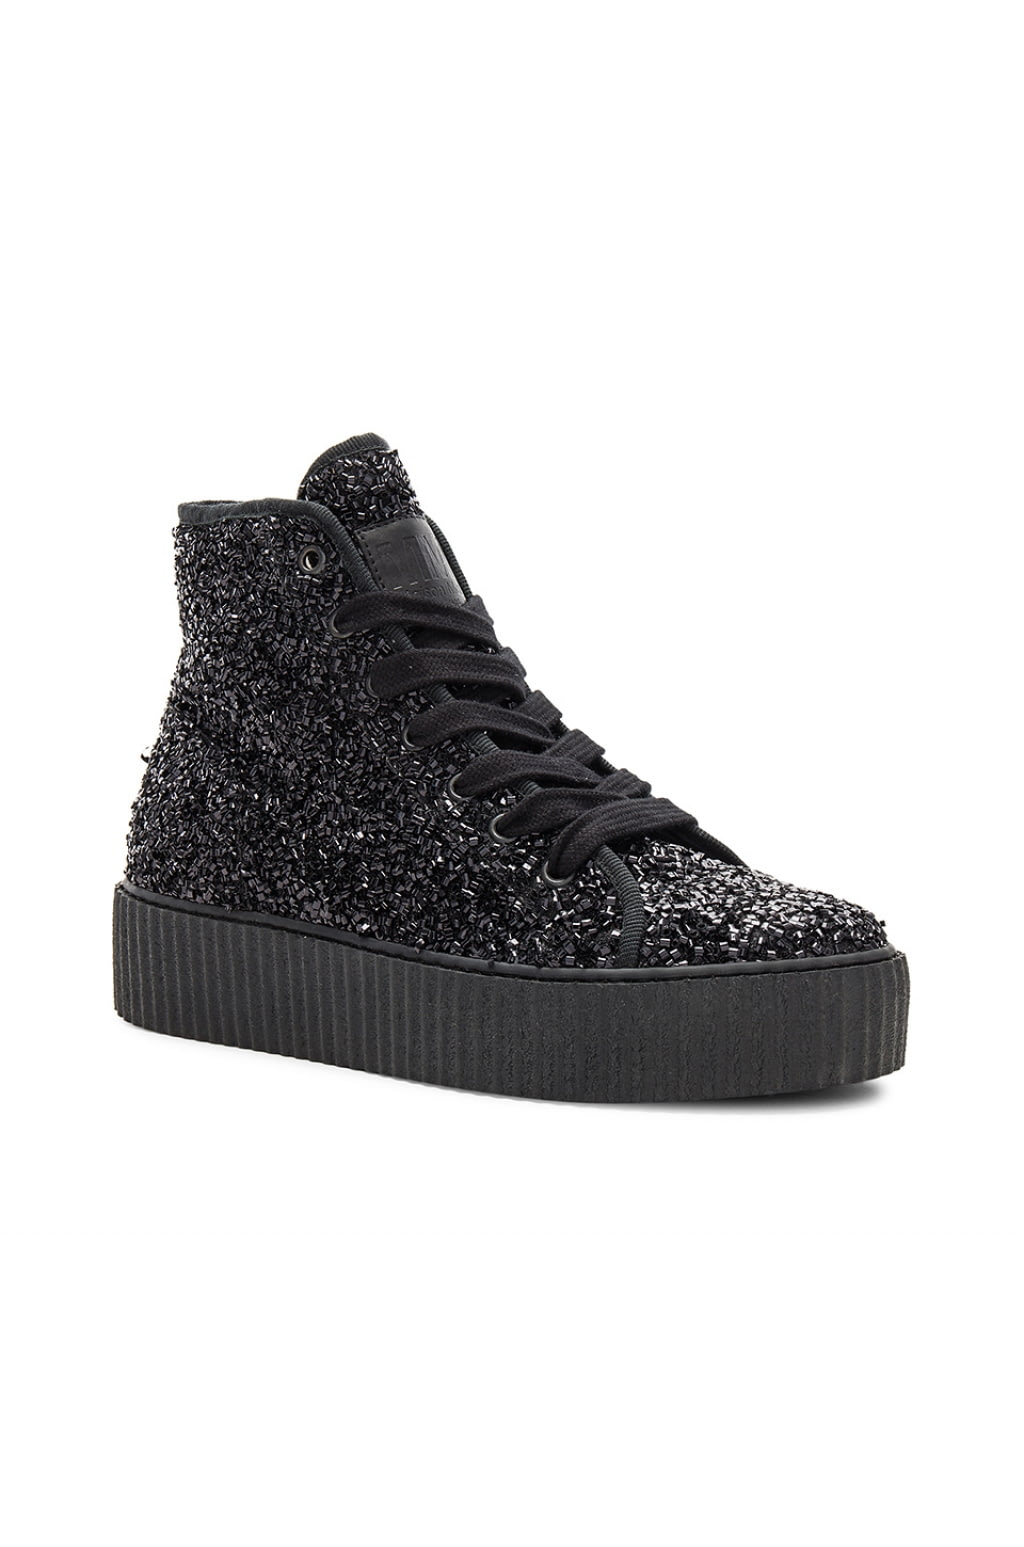 Curly hi-top sneakers - Black Maison Martin Margiela P8iHoB